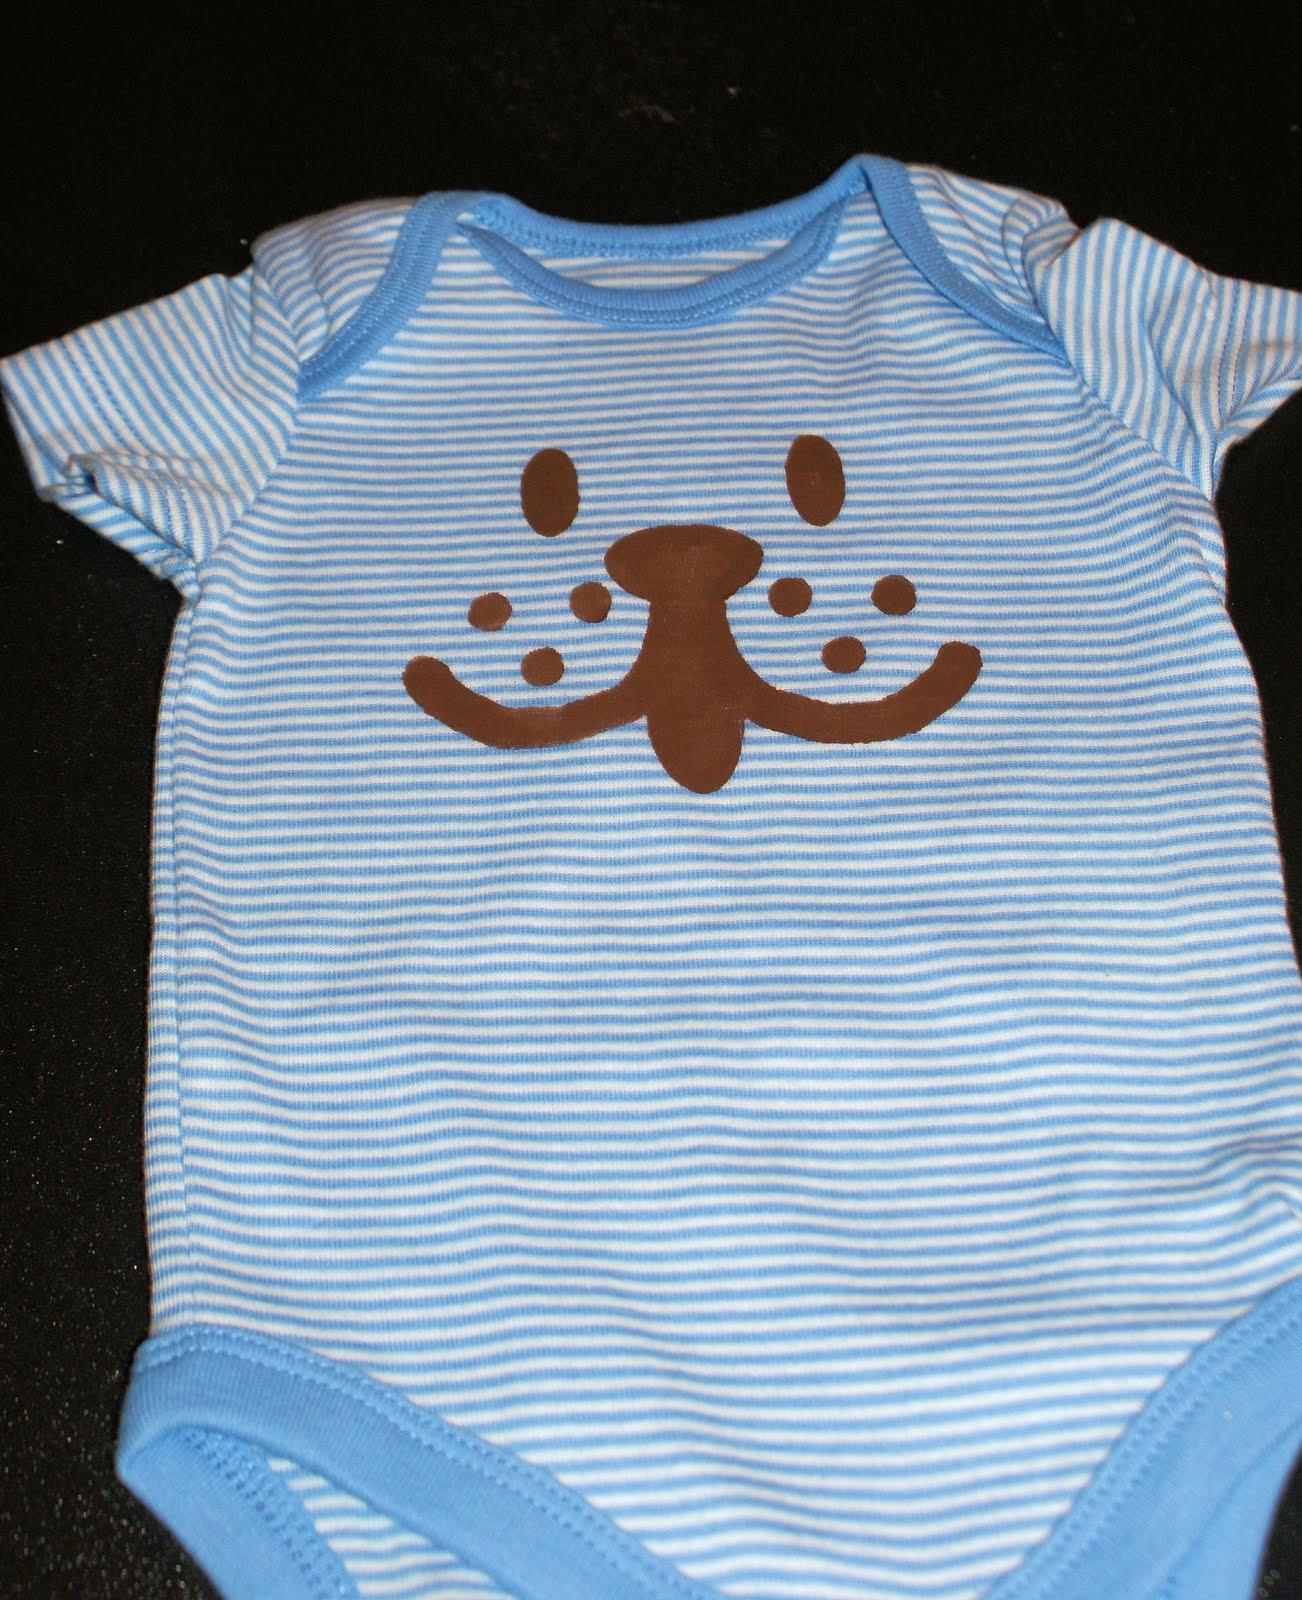 Coley's Corner: Cute Little Baby Onesies